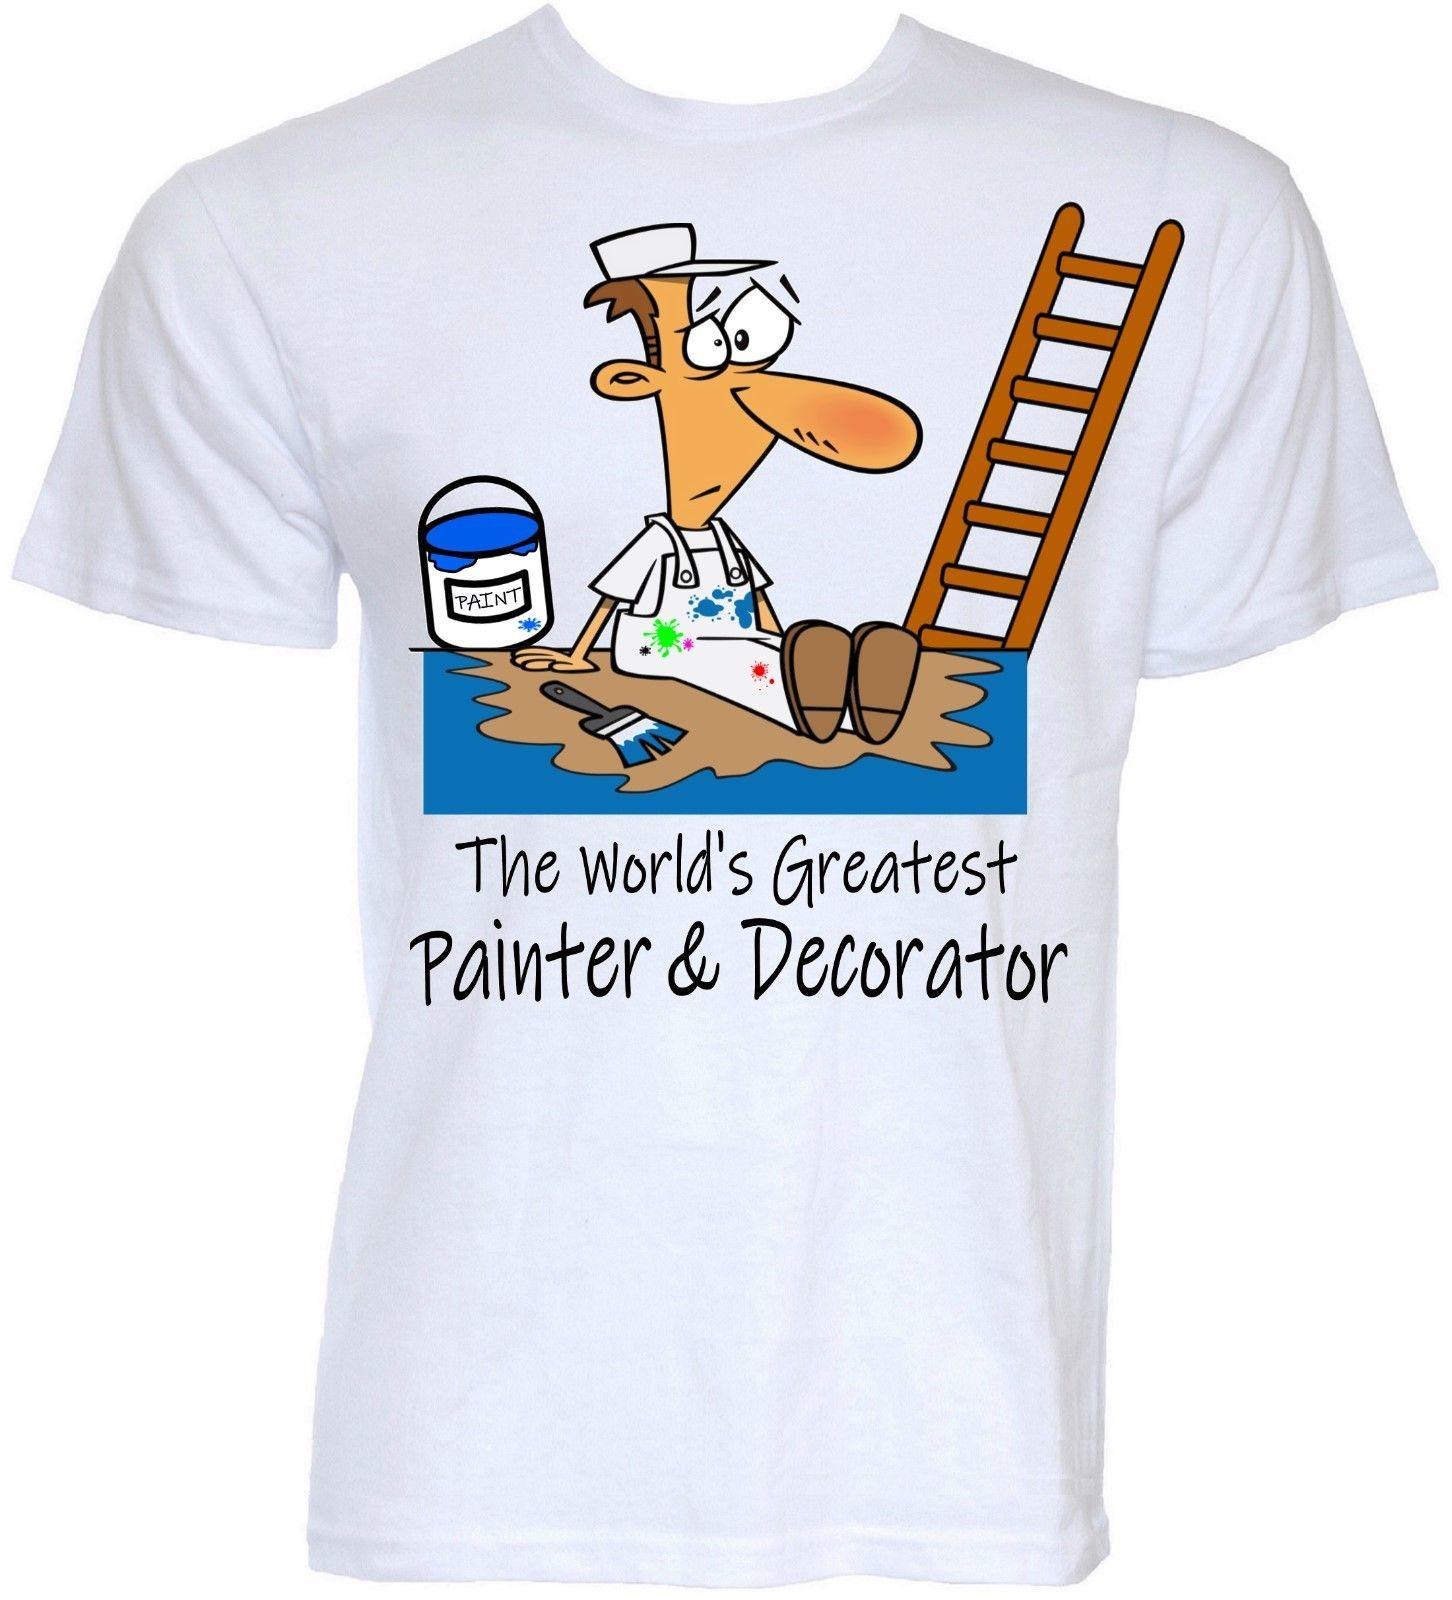 12ef88f91 Painter And Decorator T Shirts Mens Funny Cool Novelty Joke Handyman Gifts  Ideas Custom Printed Tshirt, Hip Hop Funny Tee, Mens Tee Shirts Ts Shirt  Buy ...